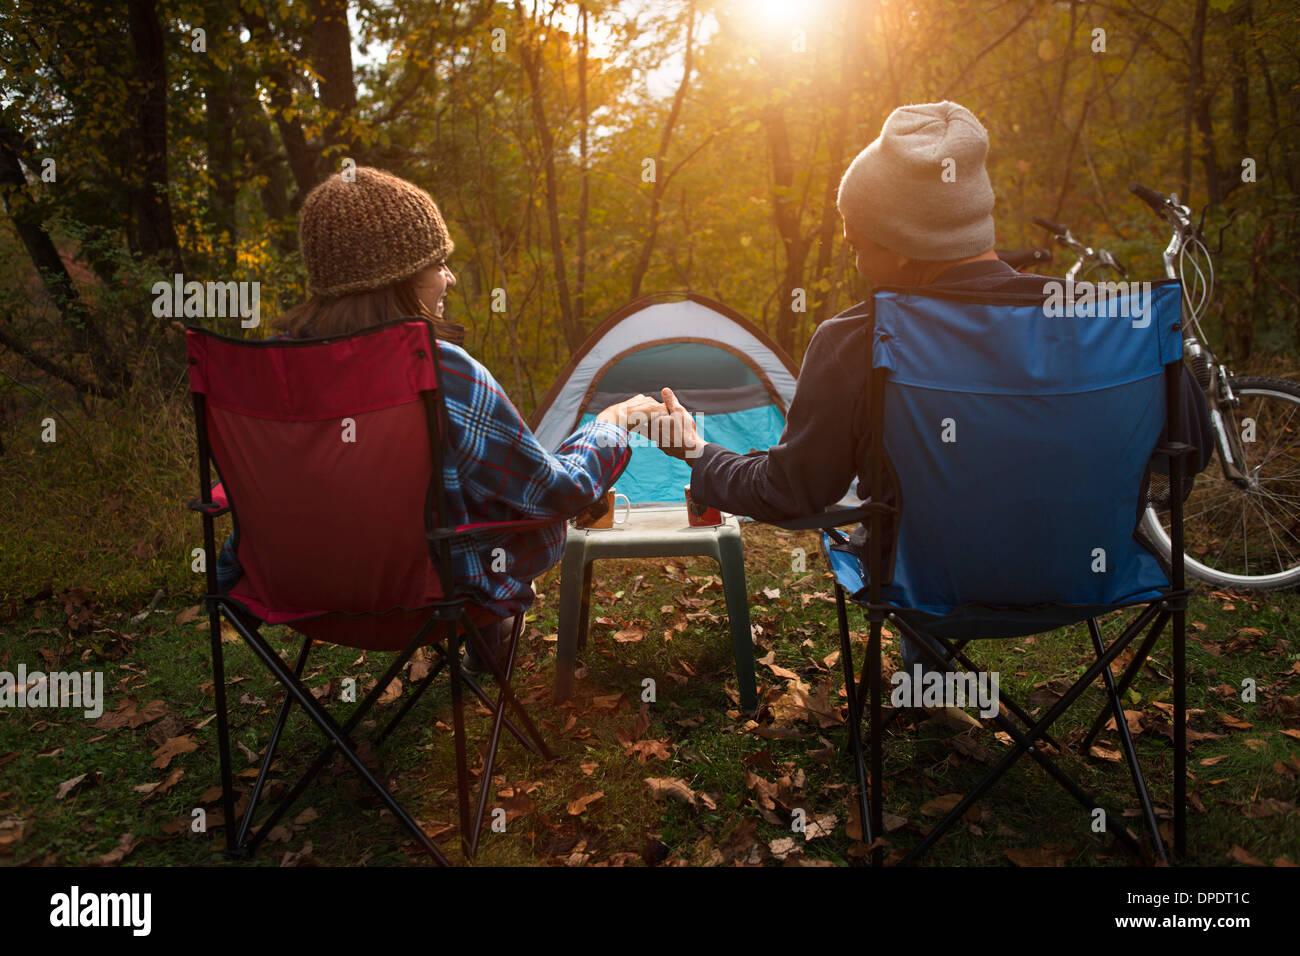 Matures Having Fun Camping